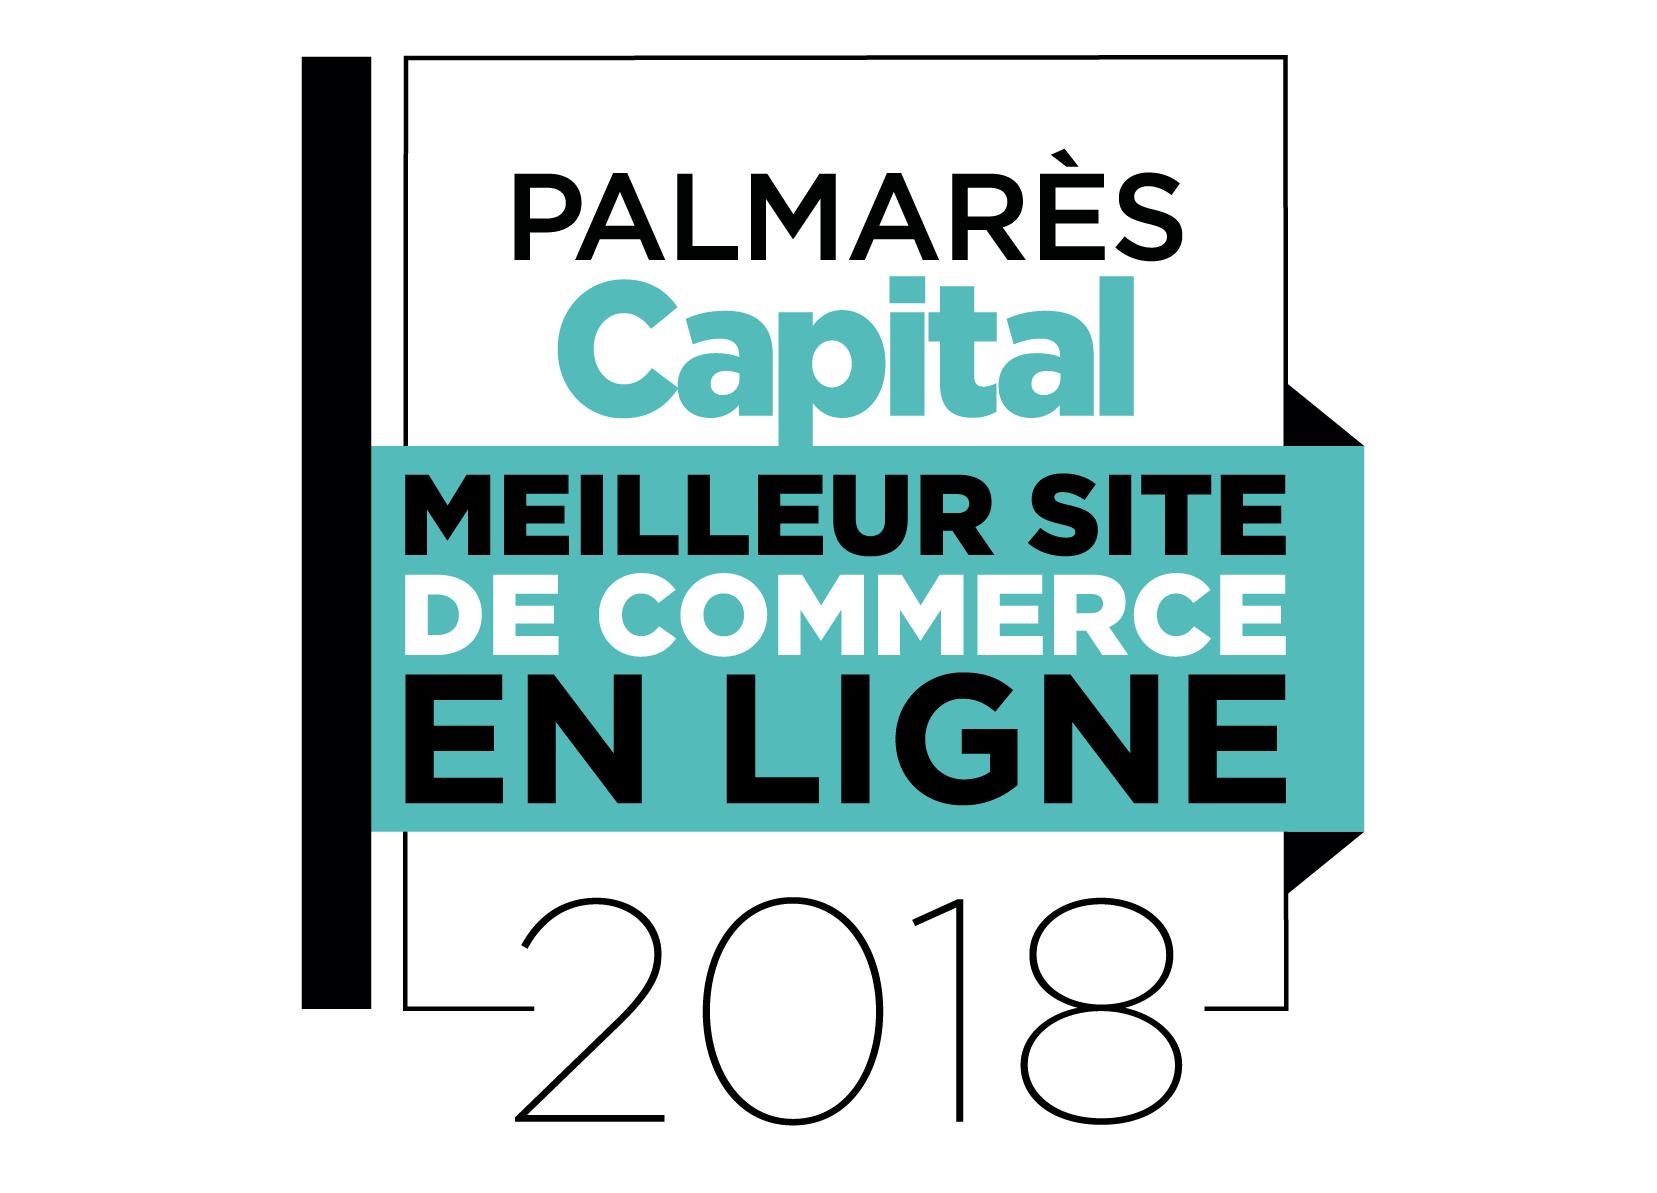 Palmares Capital